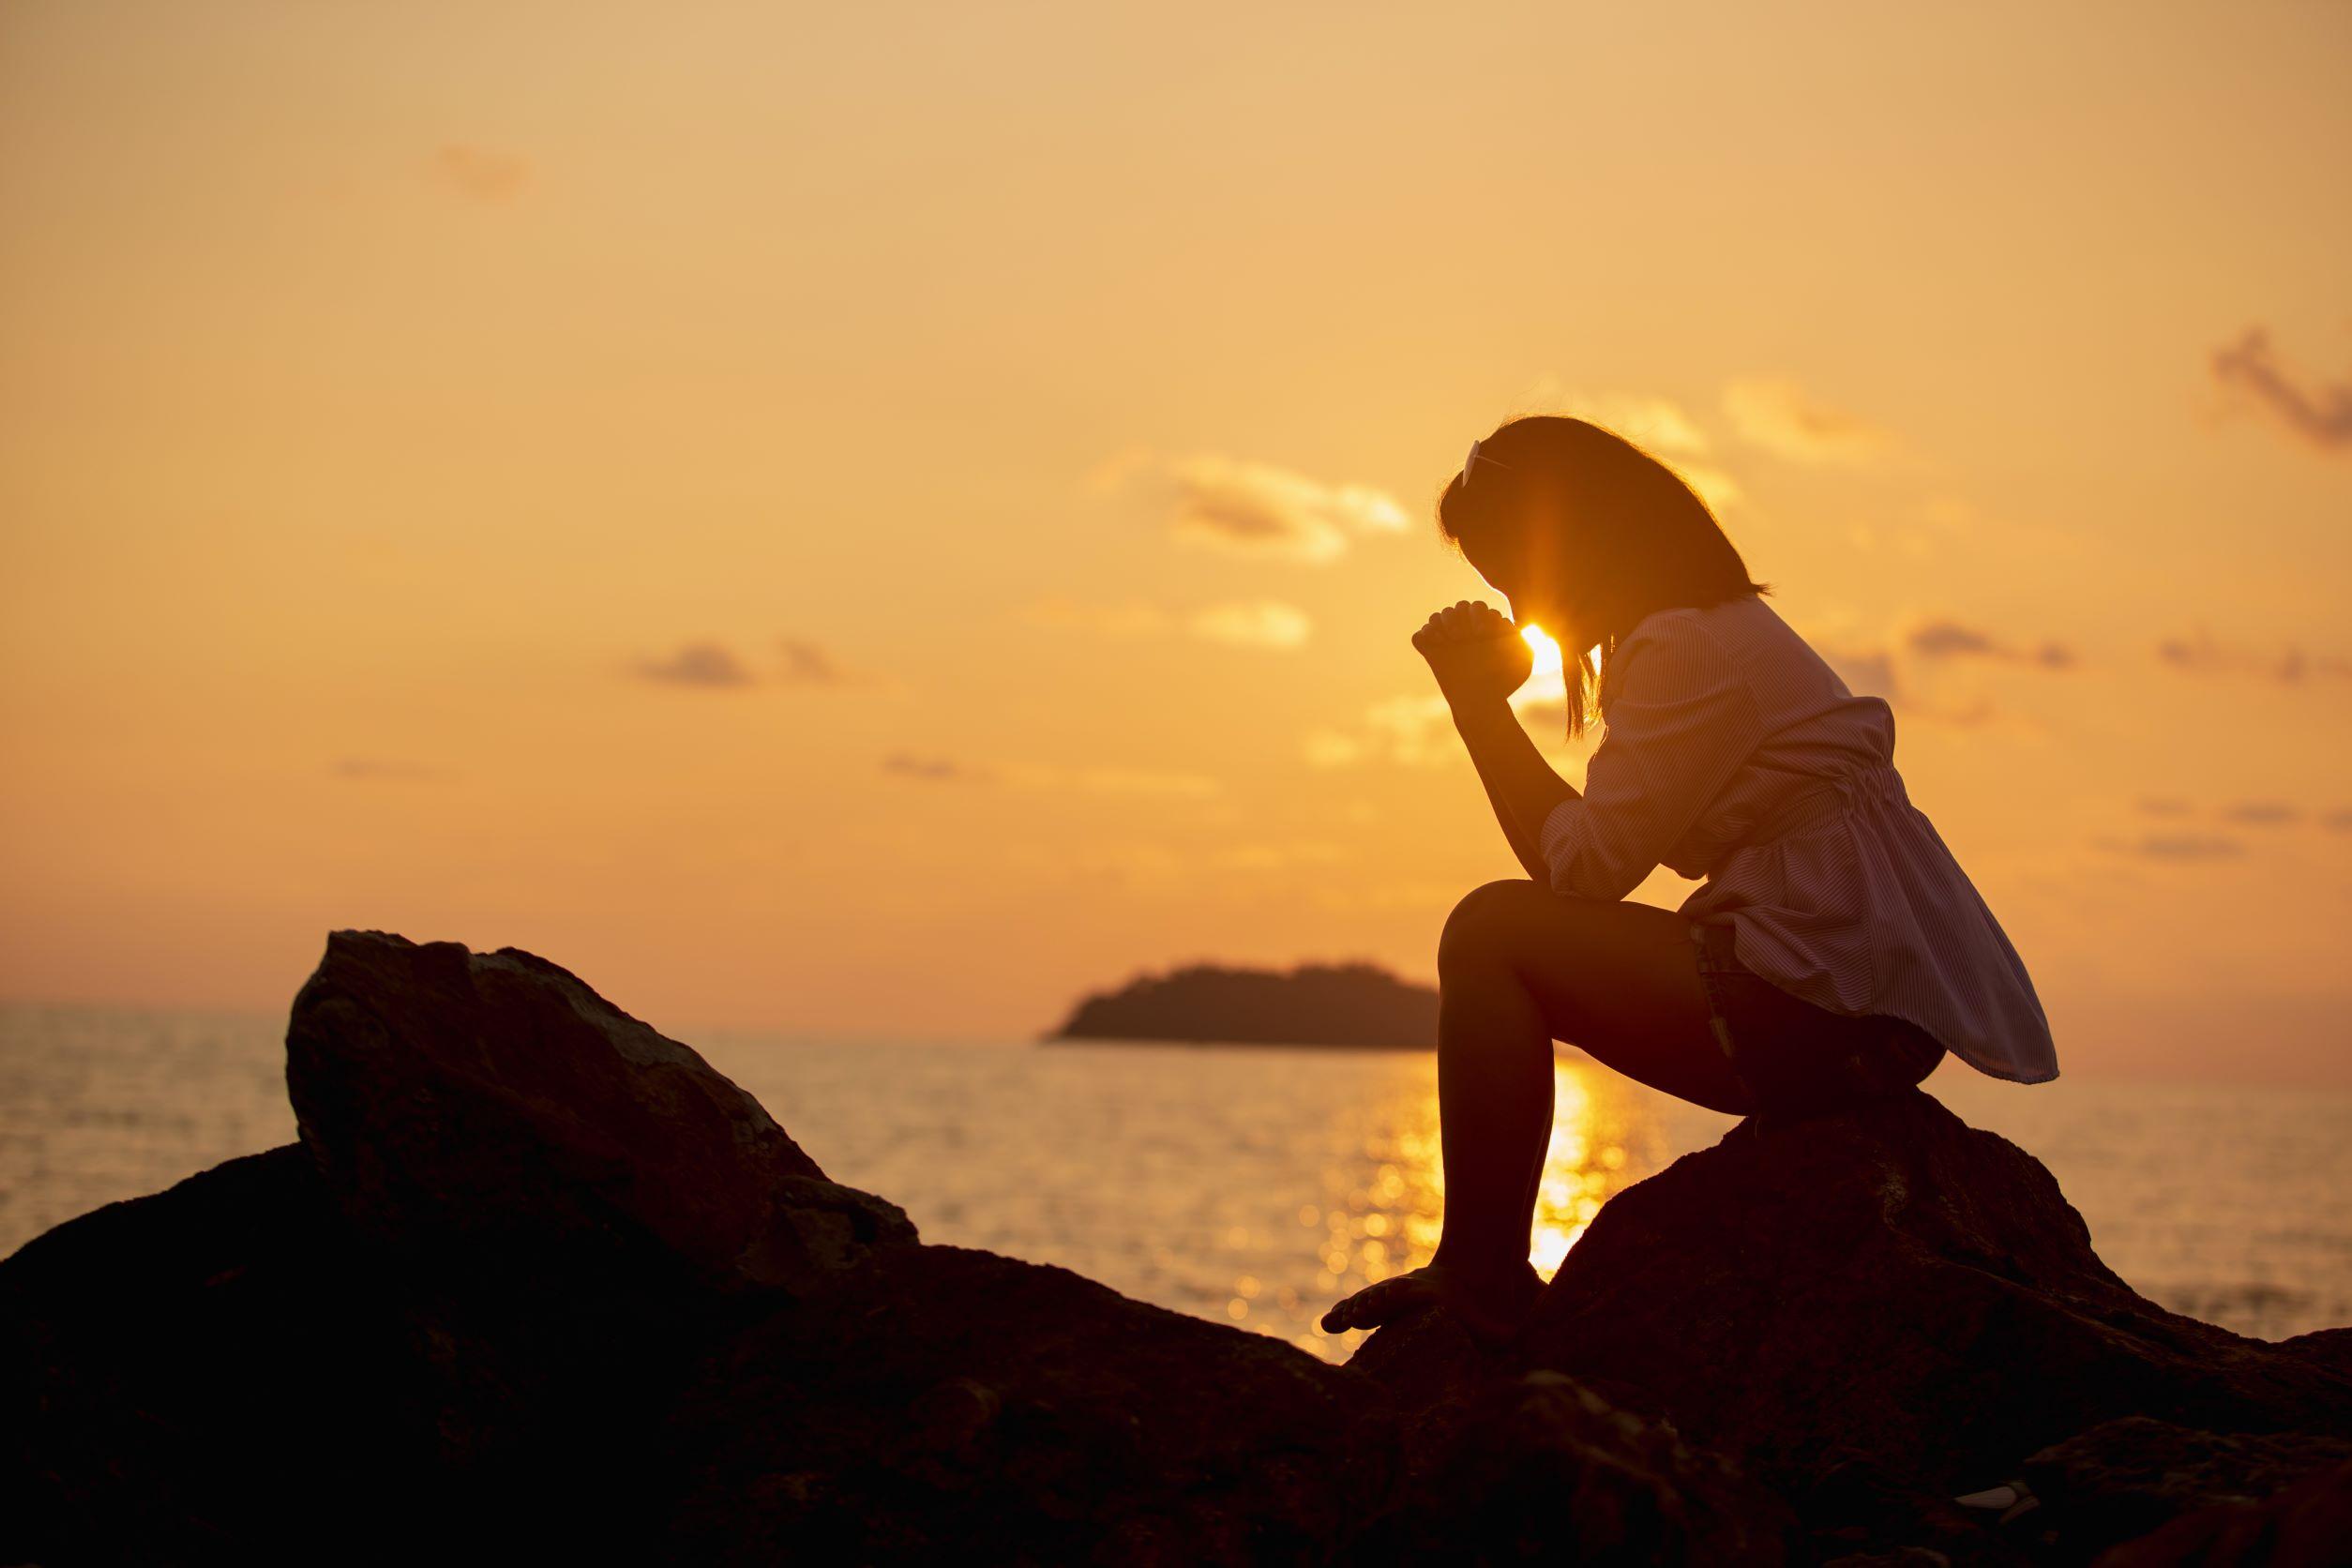 I am not enough, but God says I AM